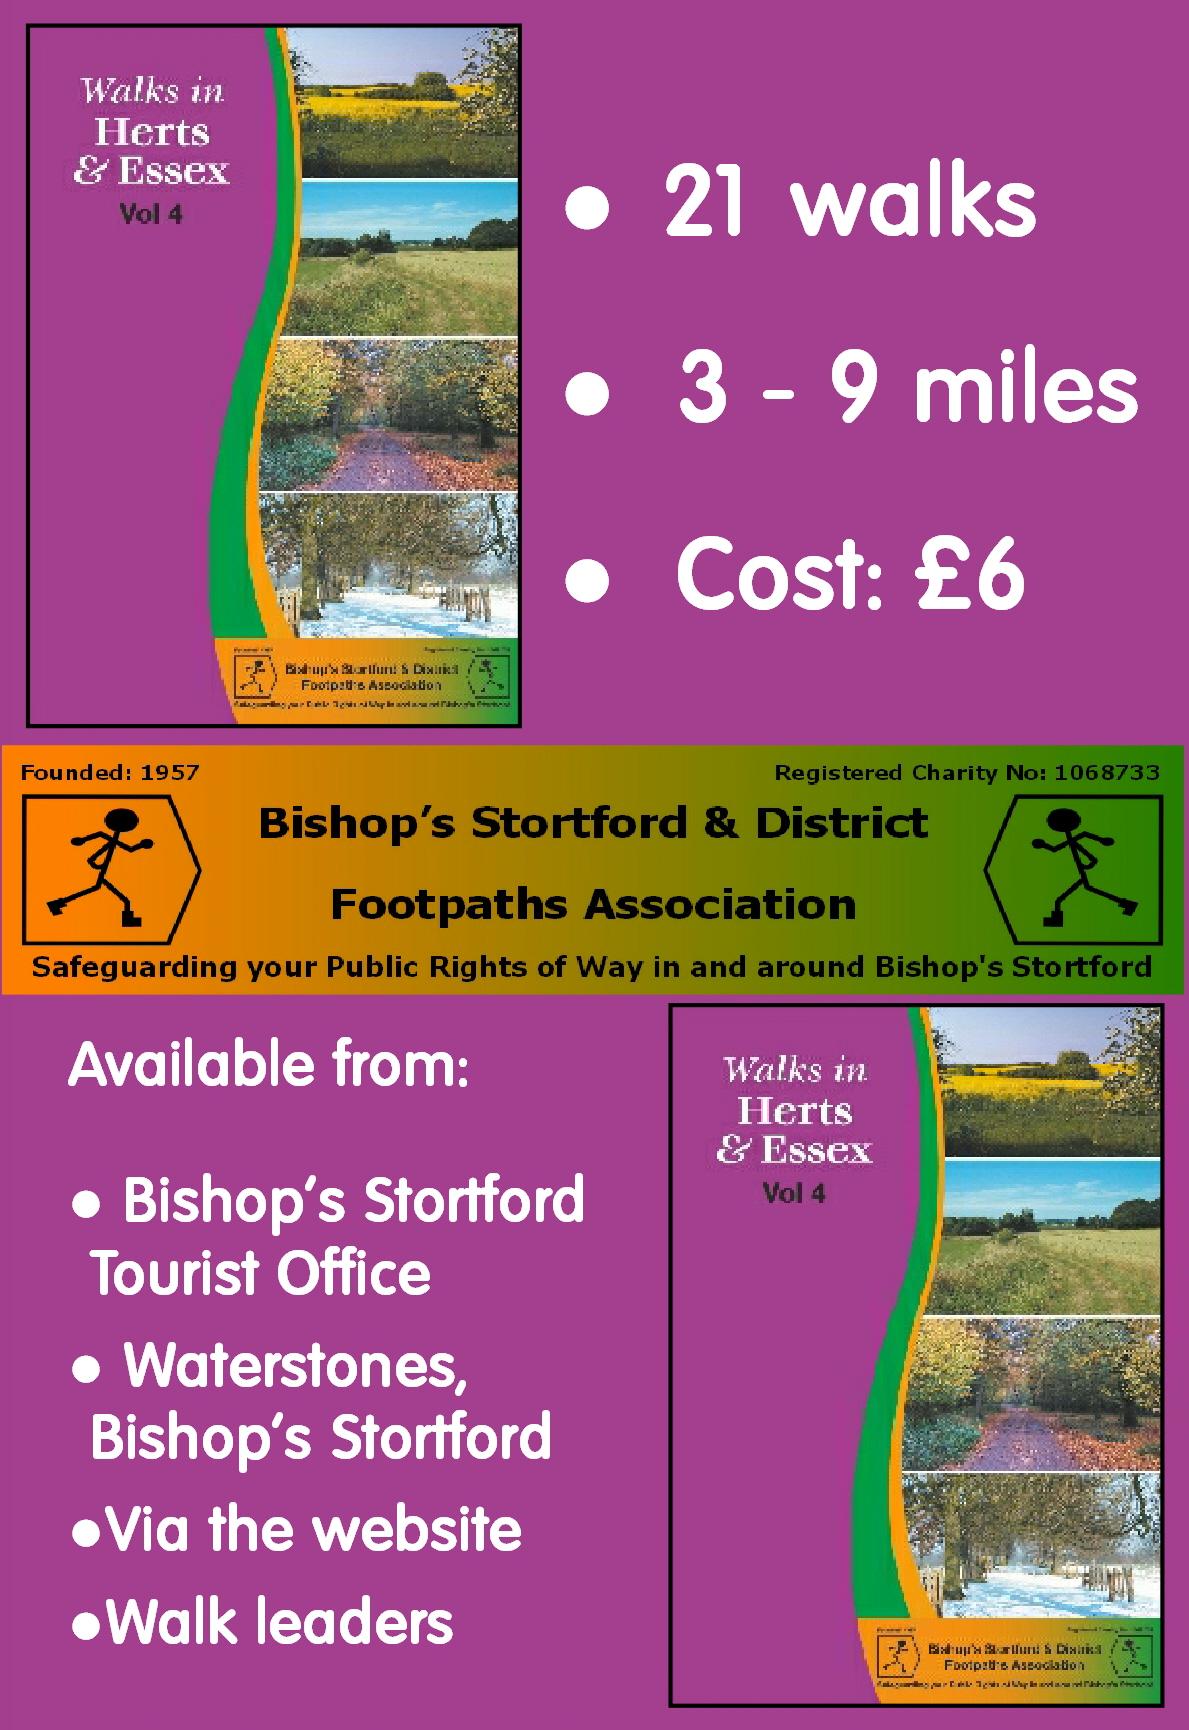 Walks Booklet advert